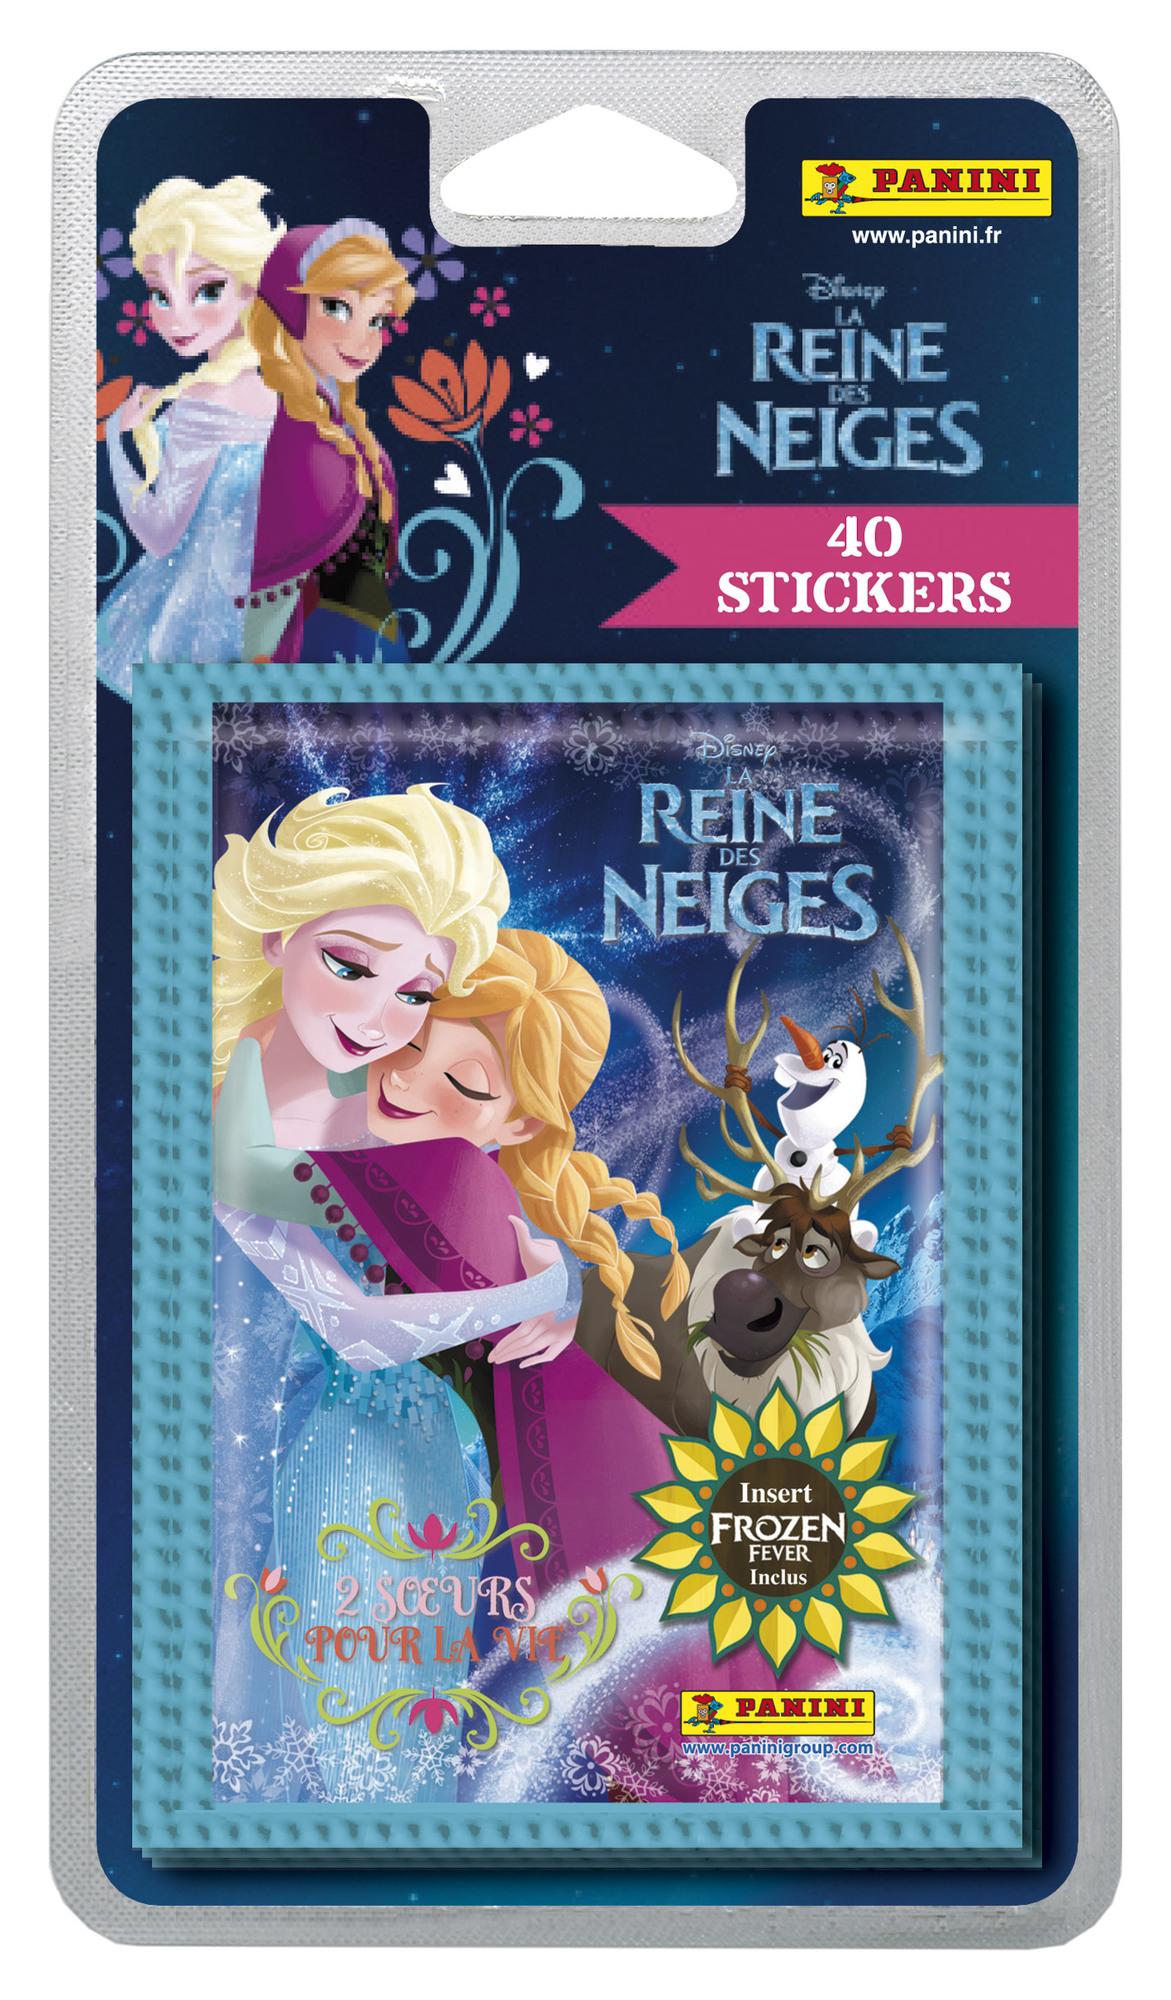 Stickers Panini Reine des Neiges - 40 stickers